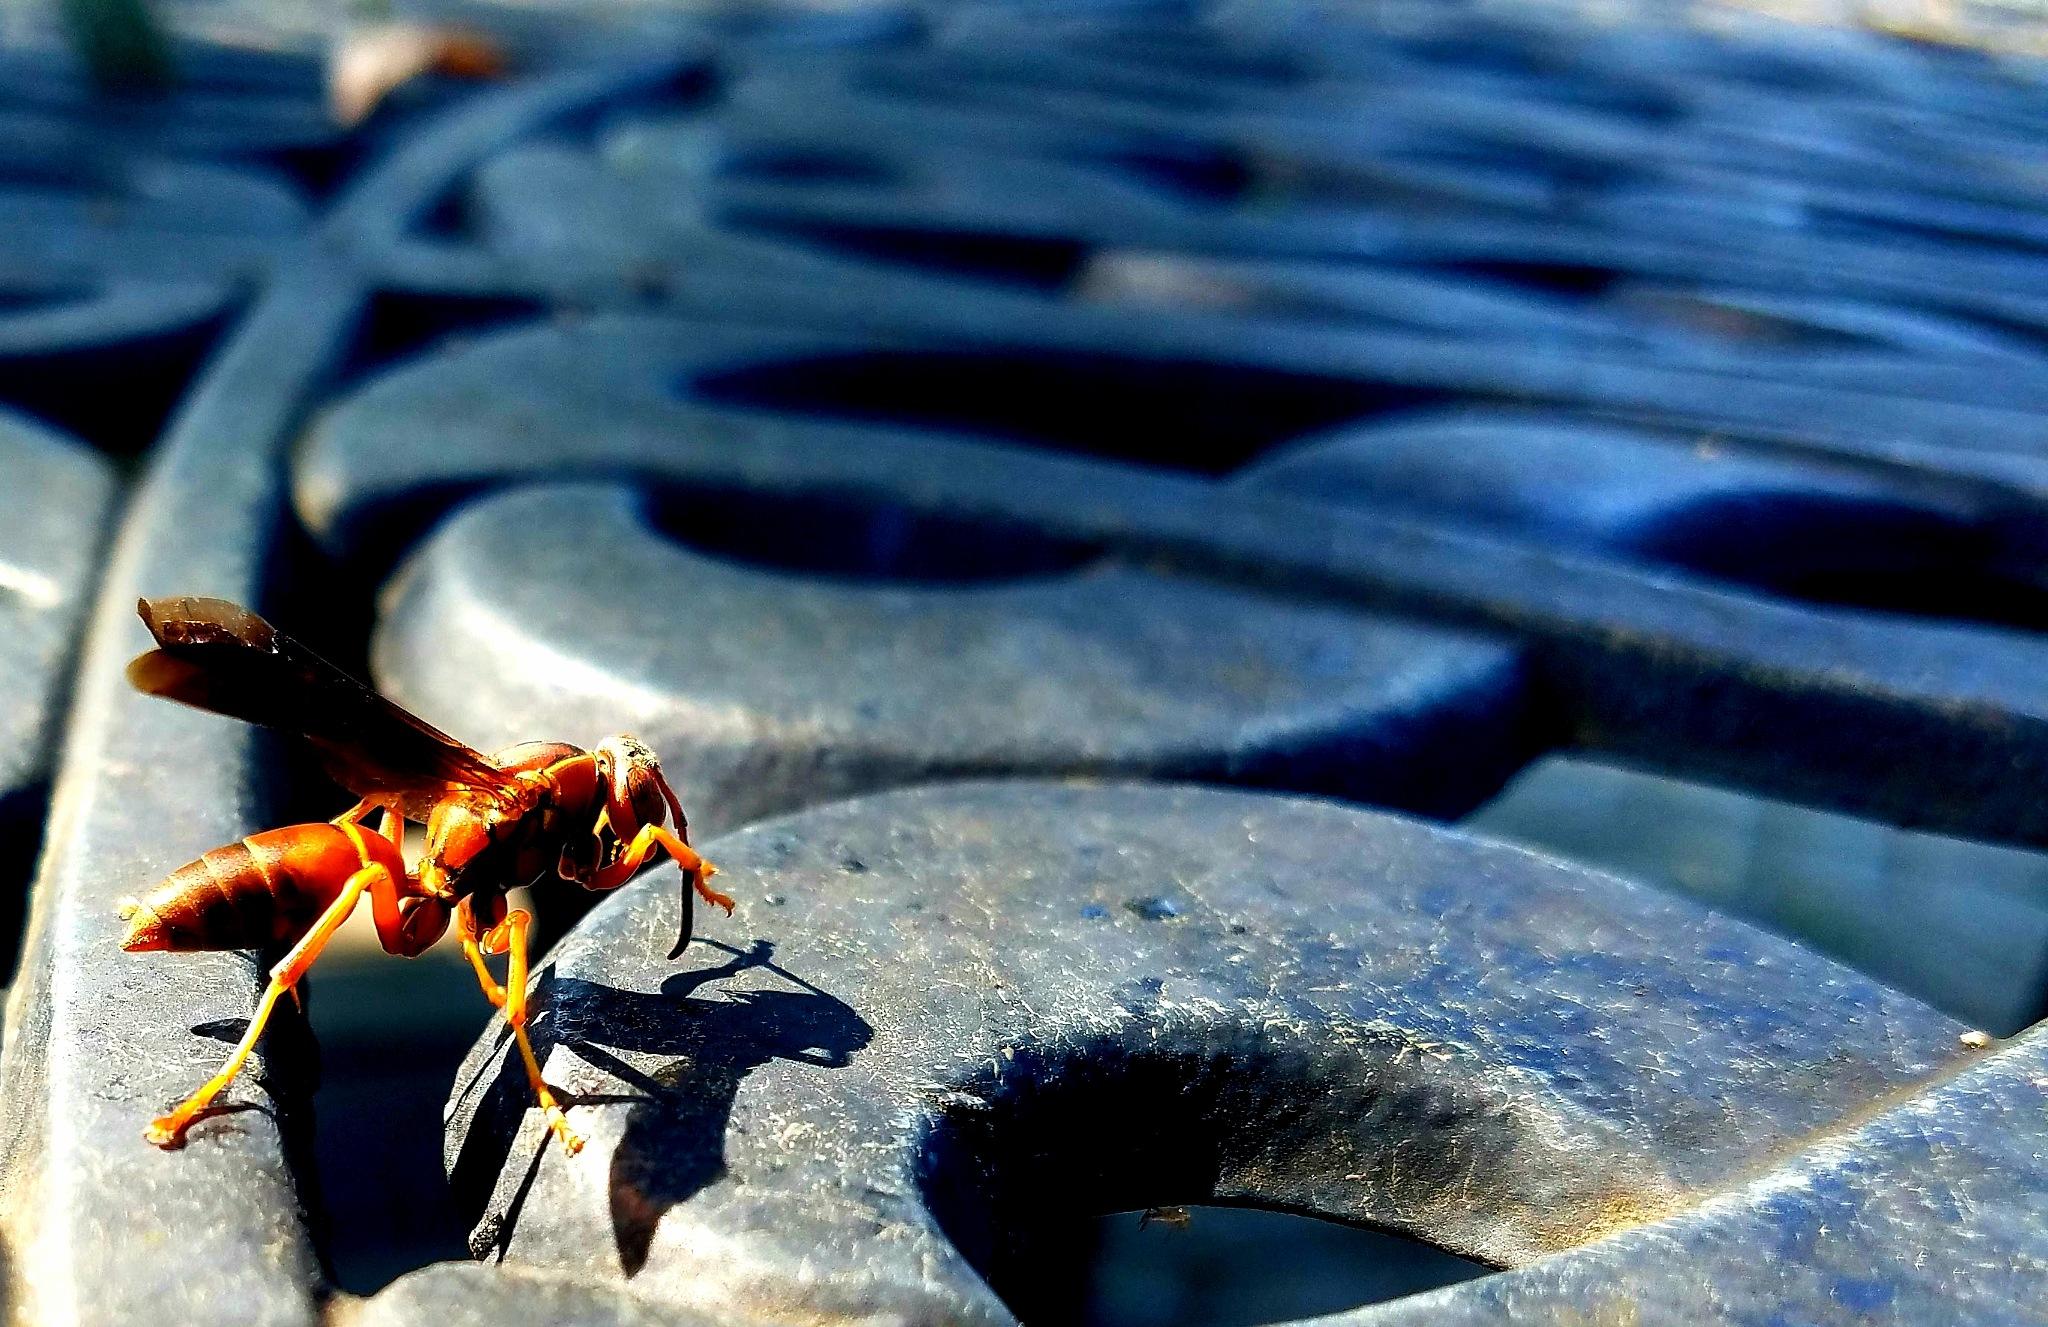 Red Wasp by Max Guzman